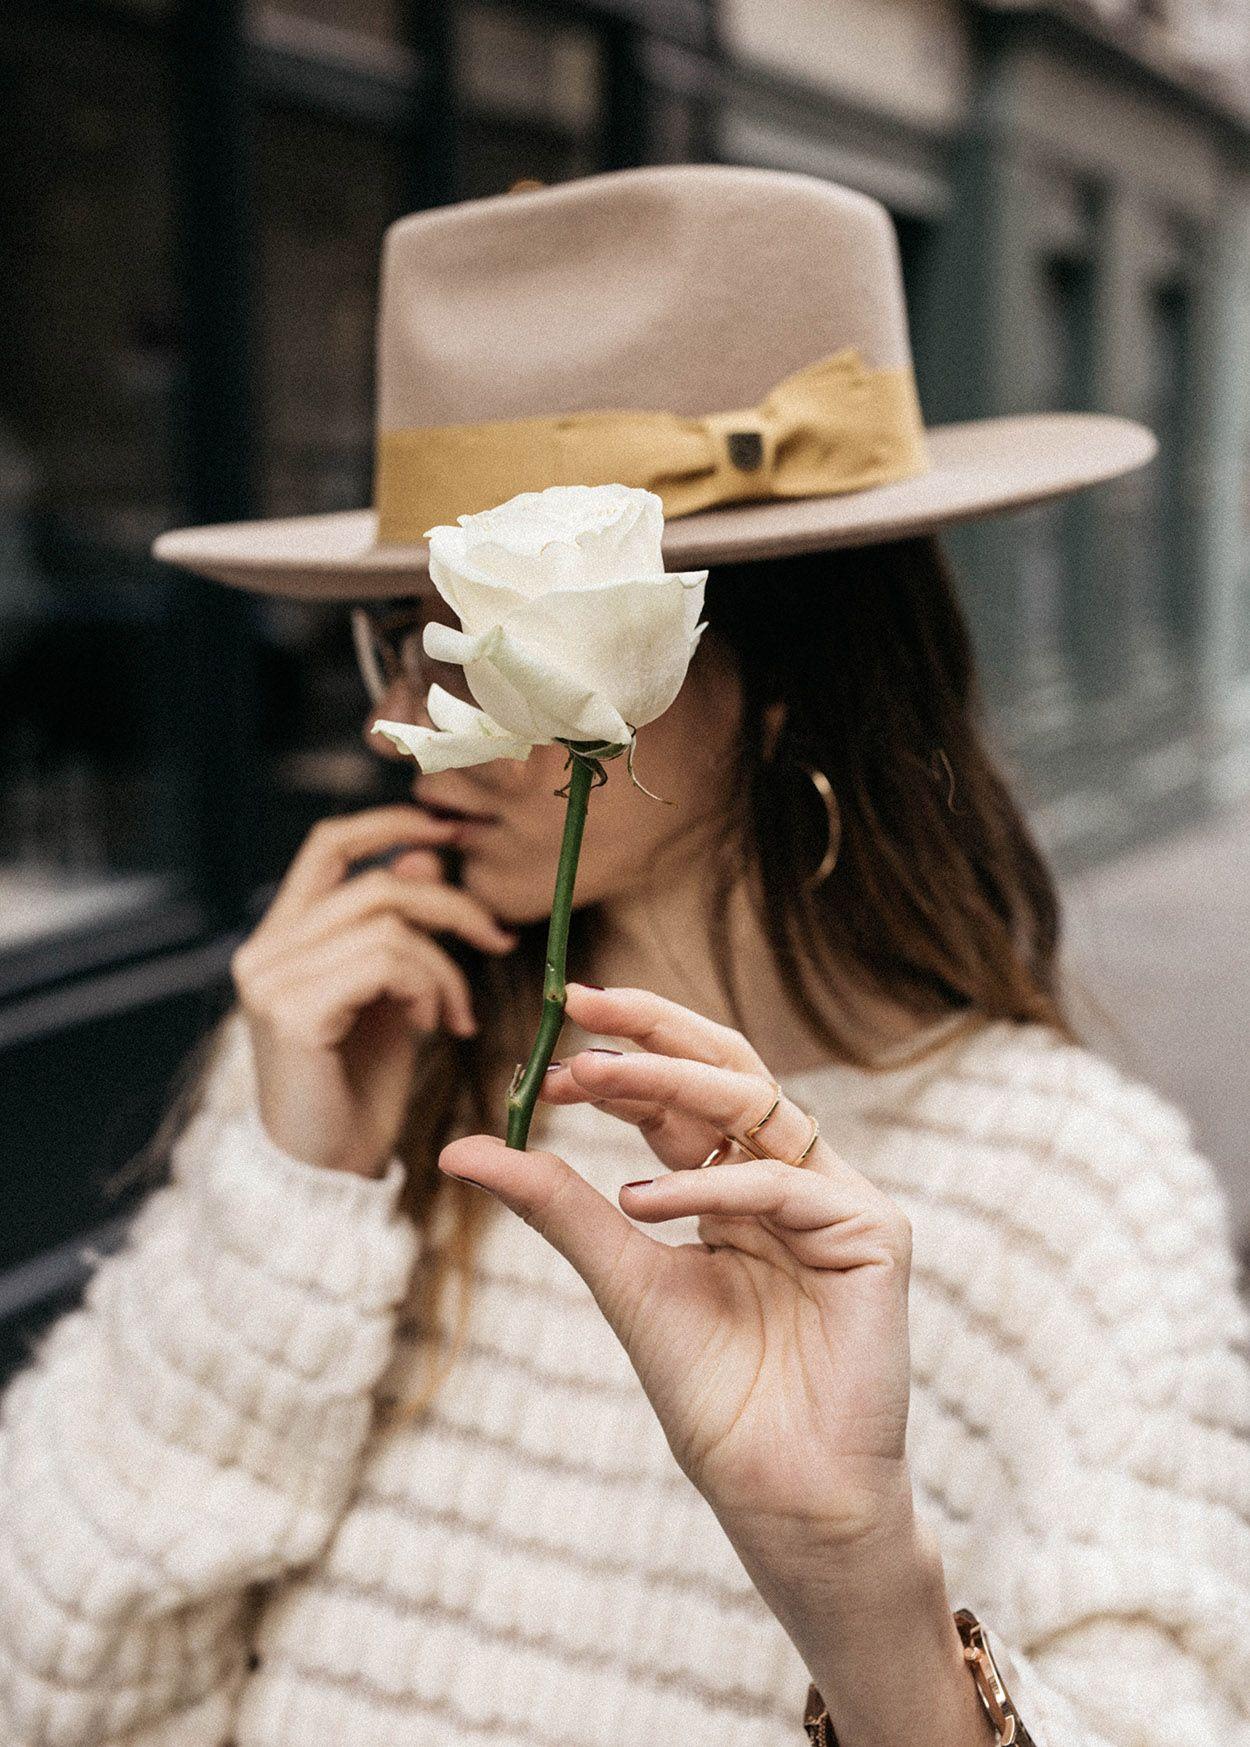 af4b5309 The White Rose Parisian Style, White Roses, Vanity, Painted Makeup Vanity,  Makeup